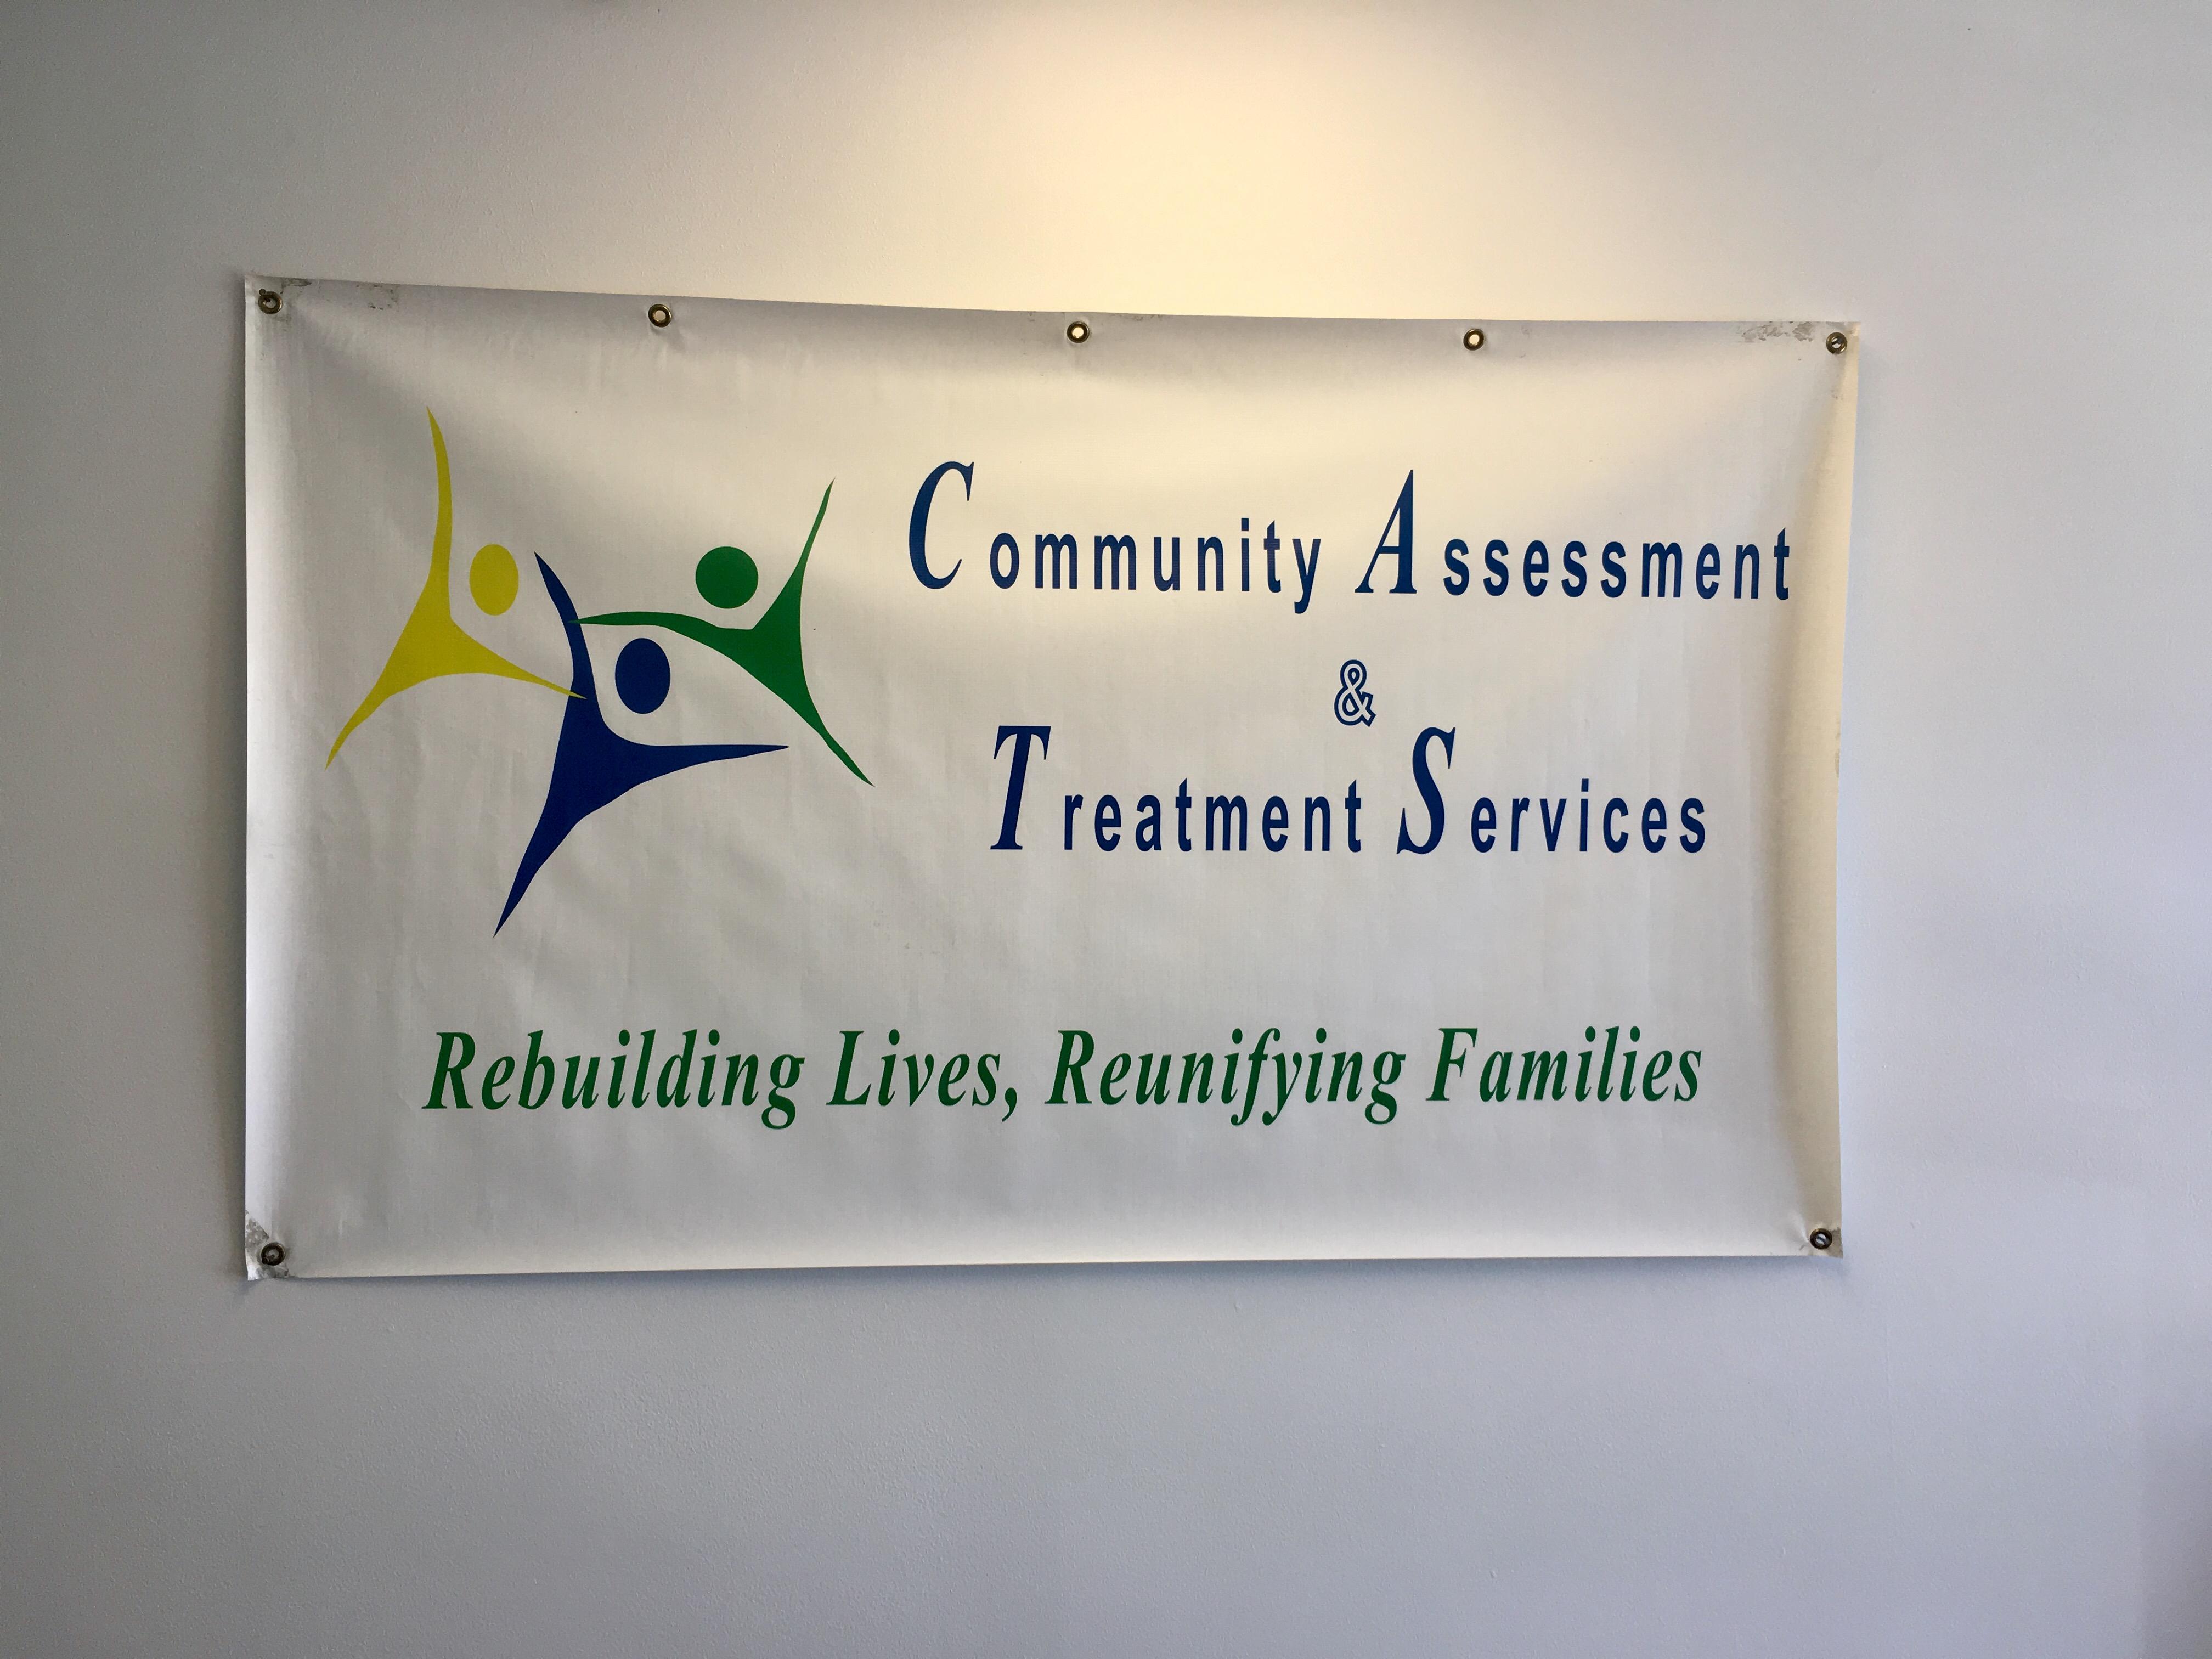 Community Assessment & Treatment Services